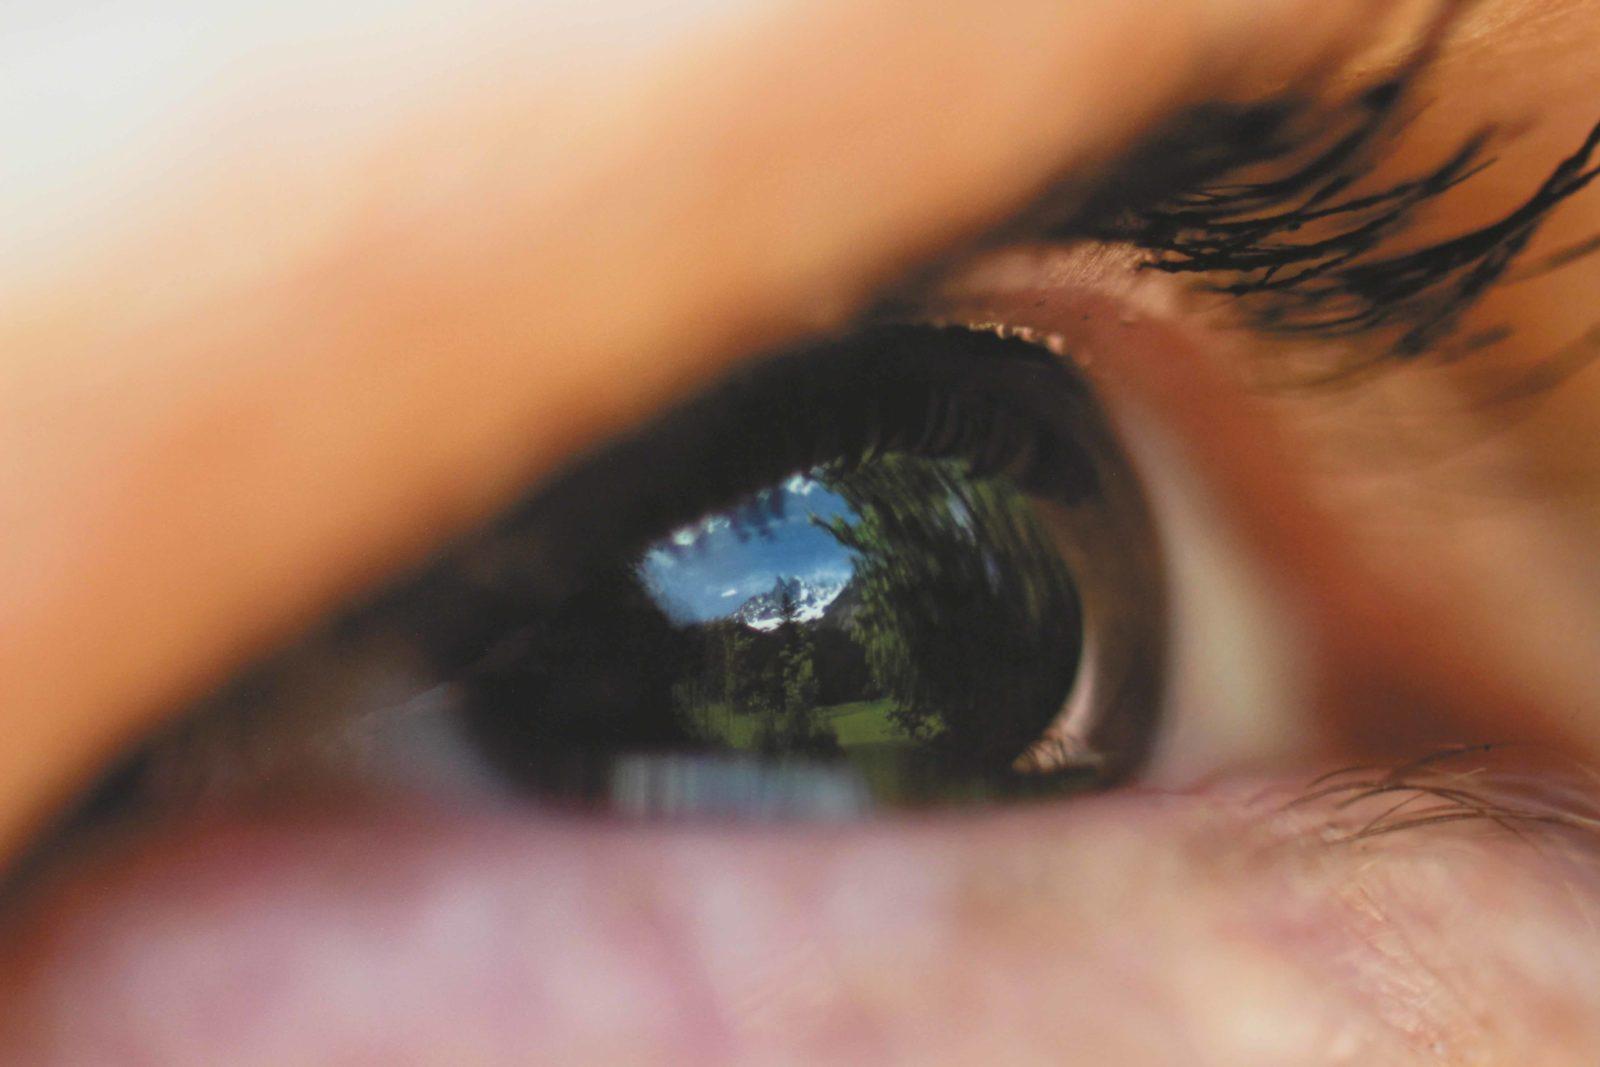 OT Chamonix l'oeil de Cécile Gruffat